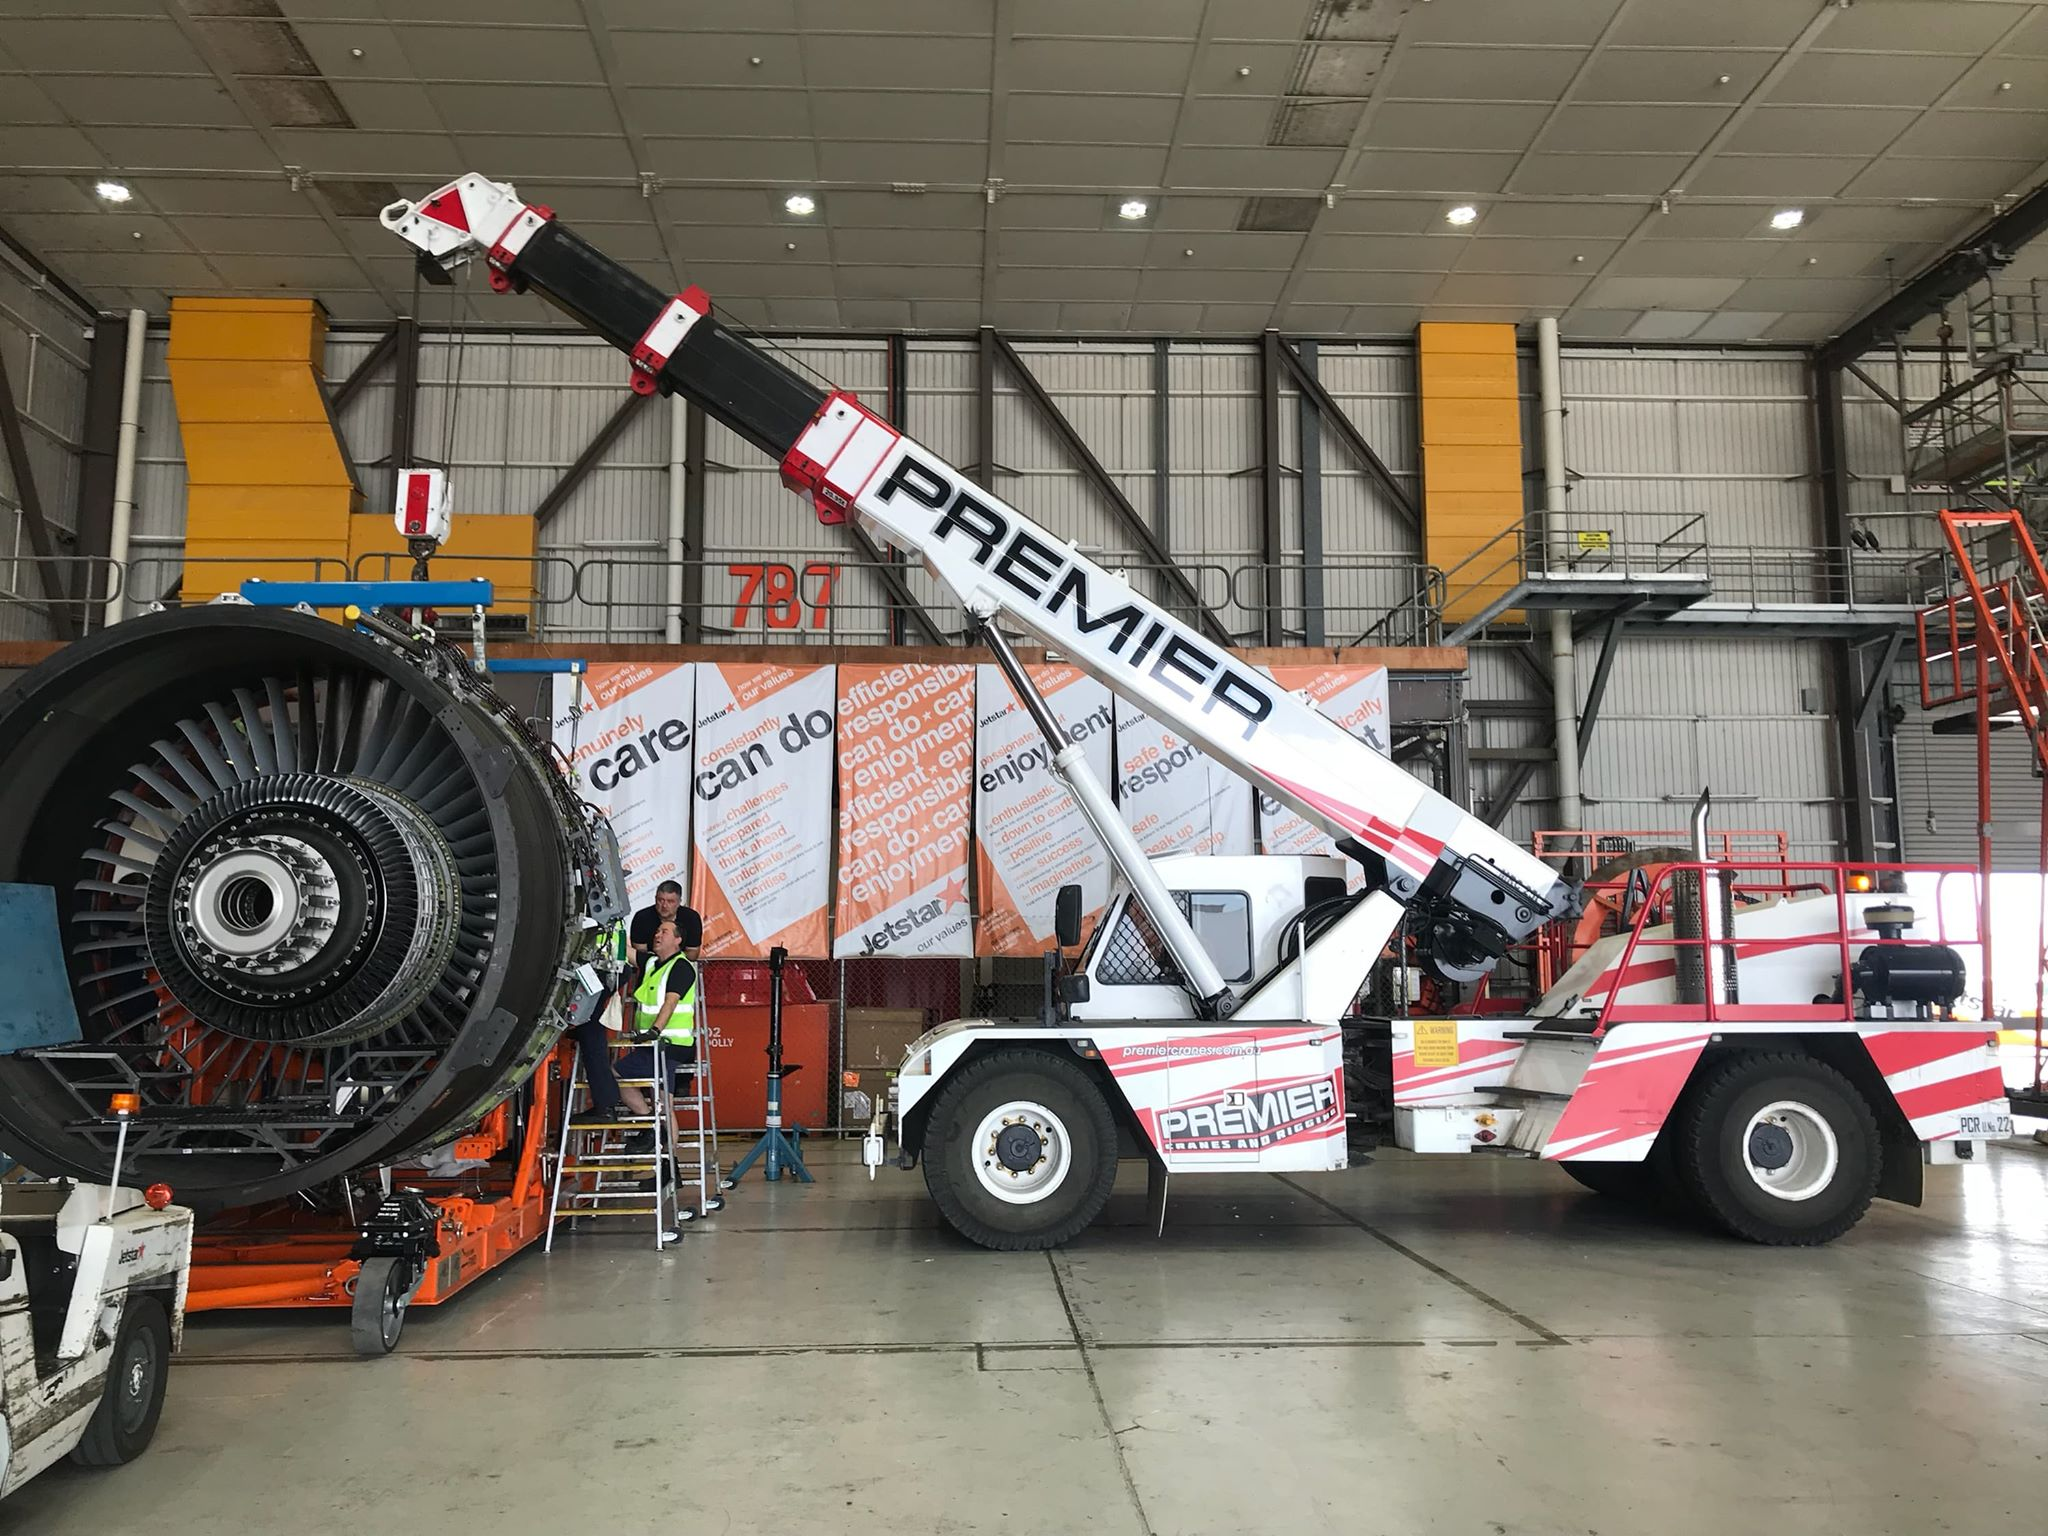 Jet Engine Lift – JETSTAR Melbourne